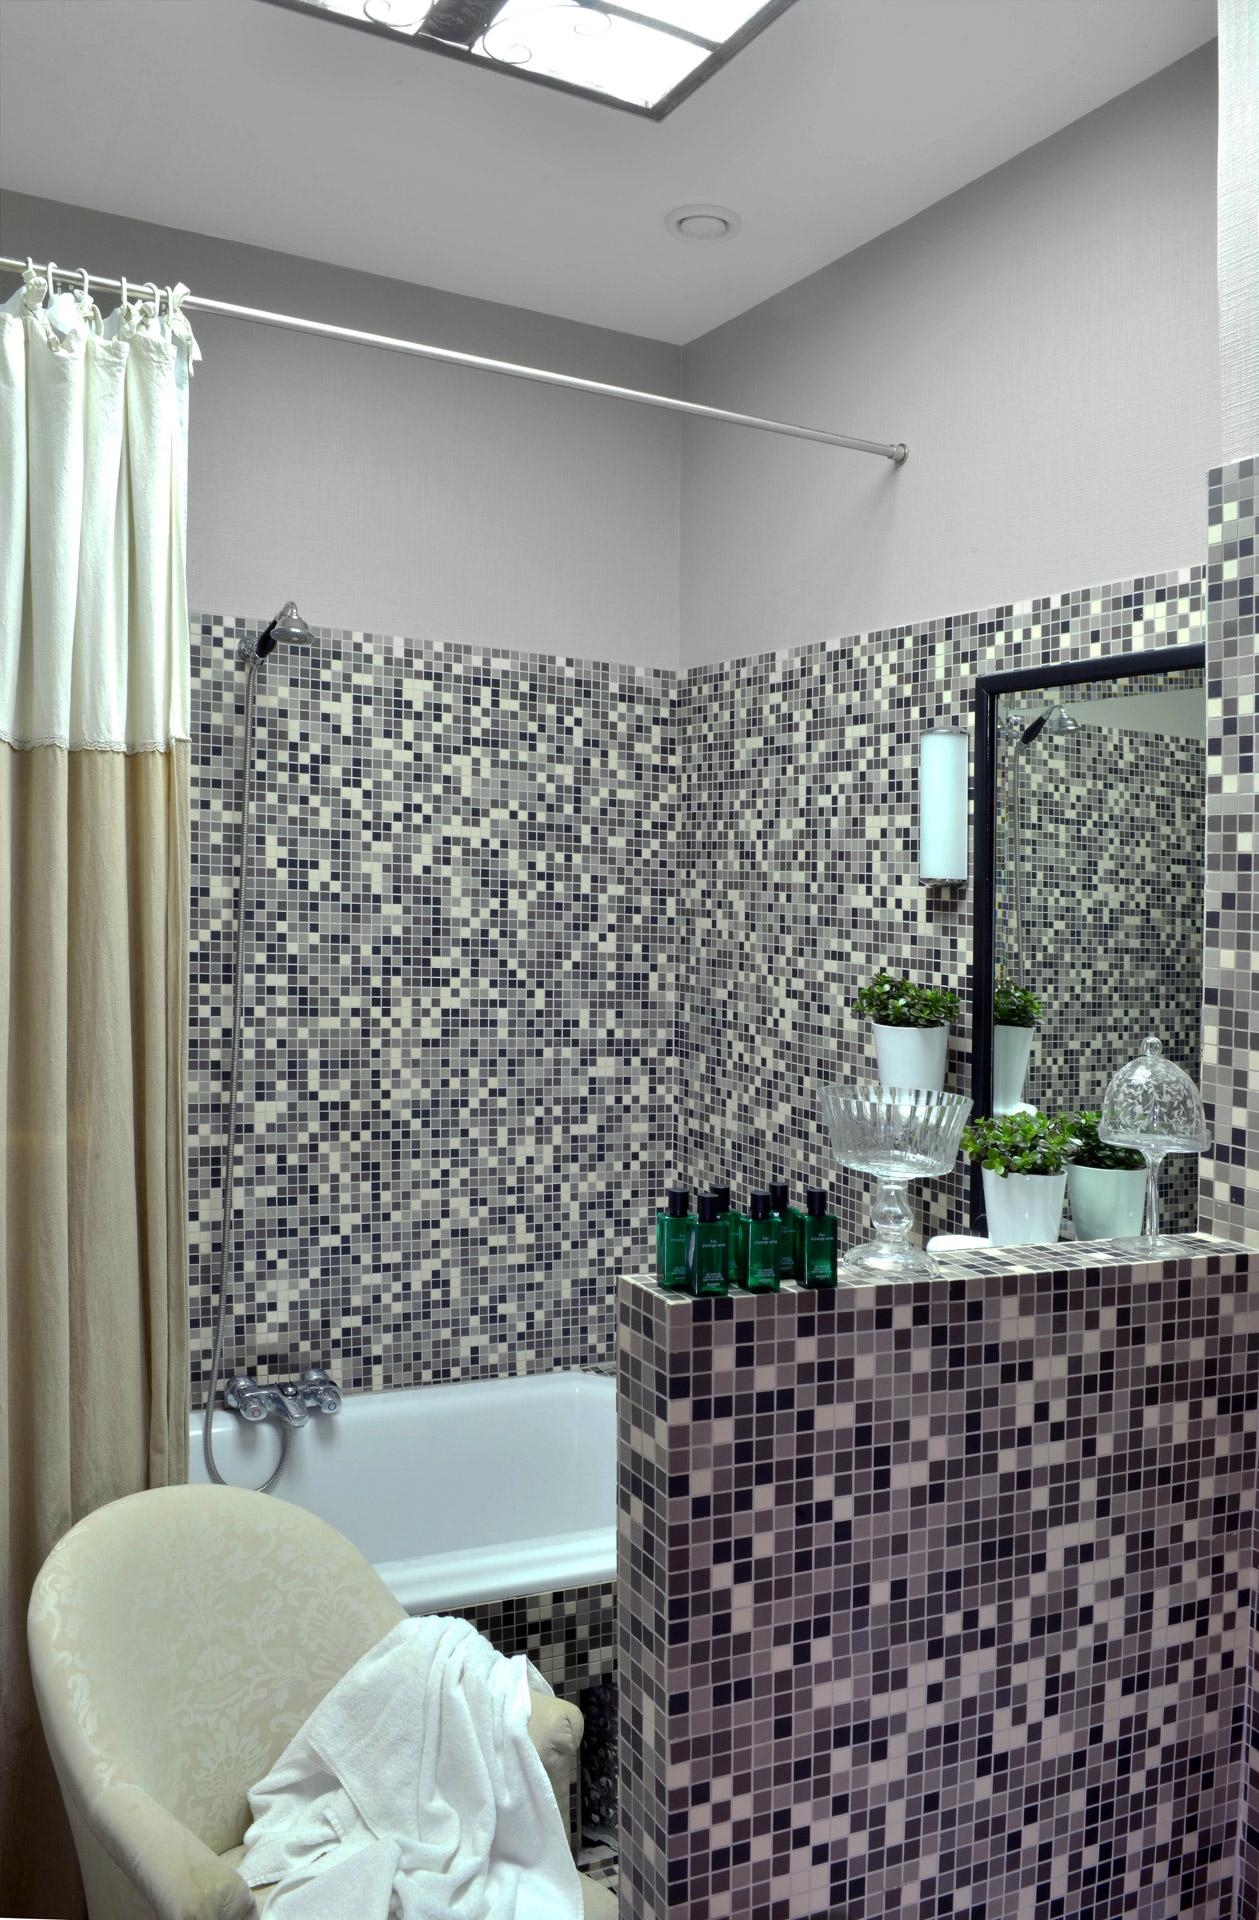 Salle De Bain Shower Curtain ~ salle de bain julio co